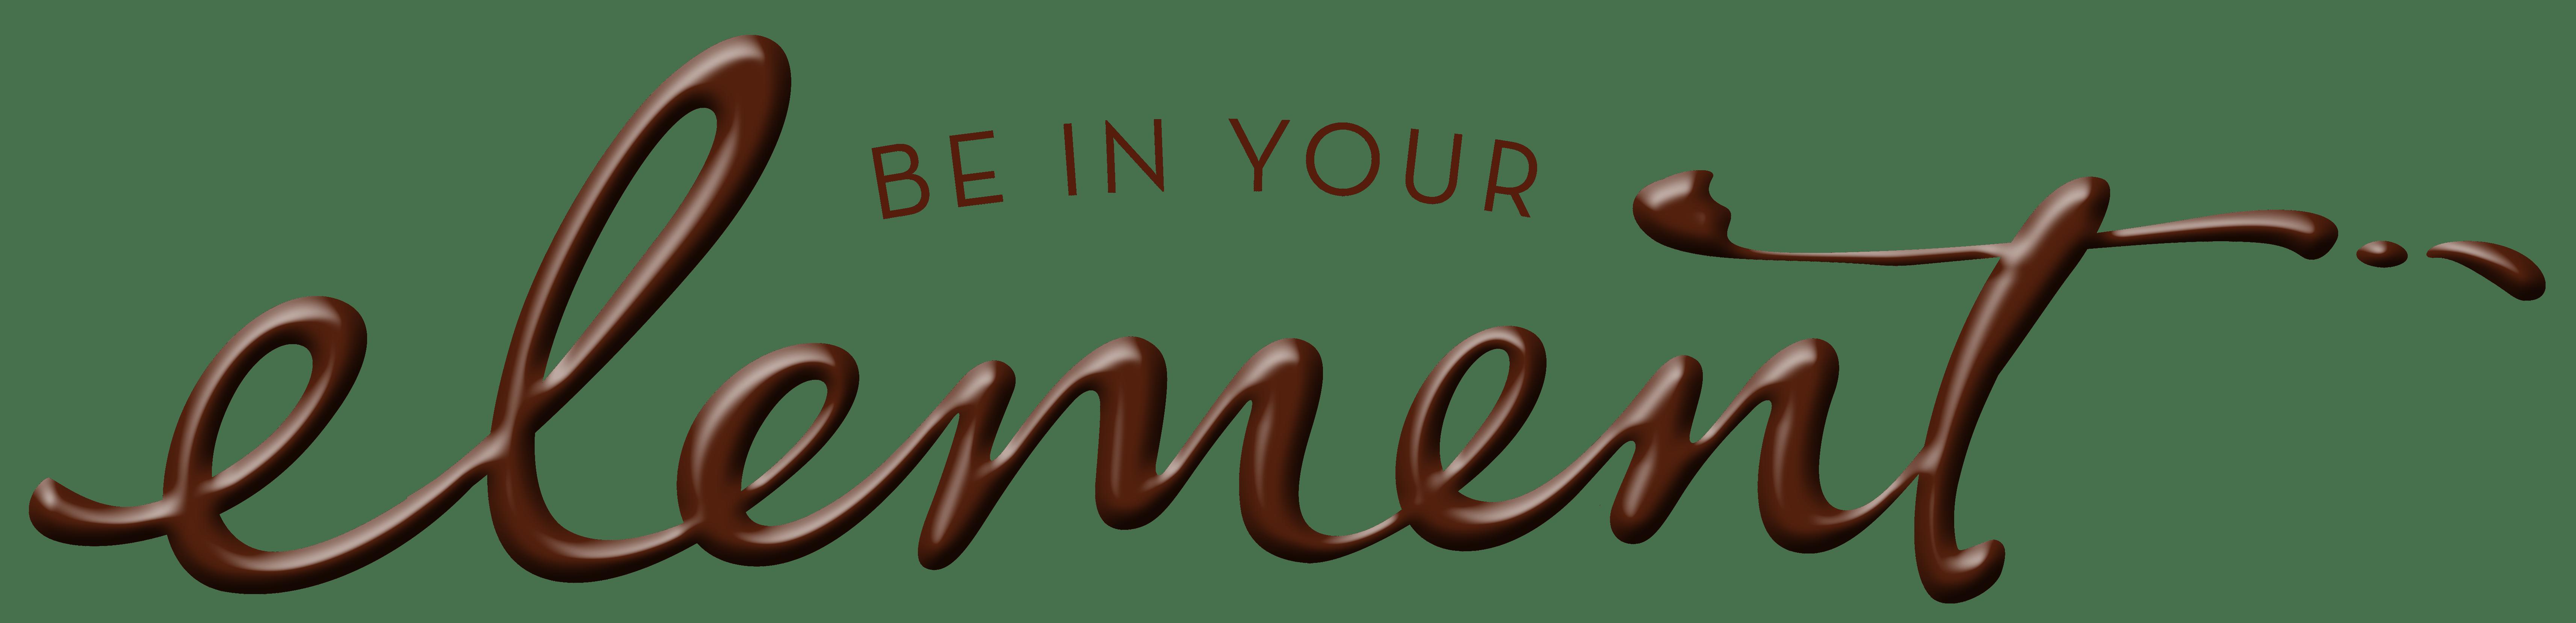 Element Snacks company logo